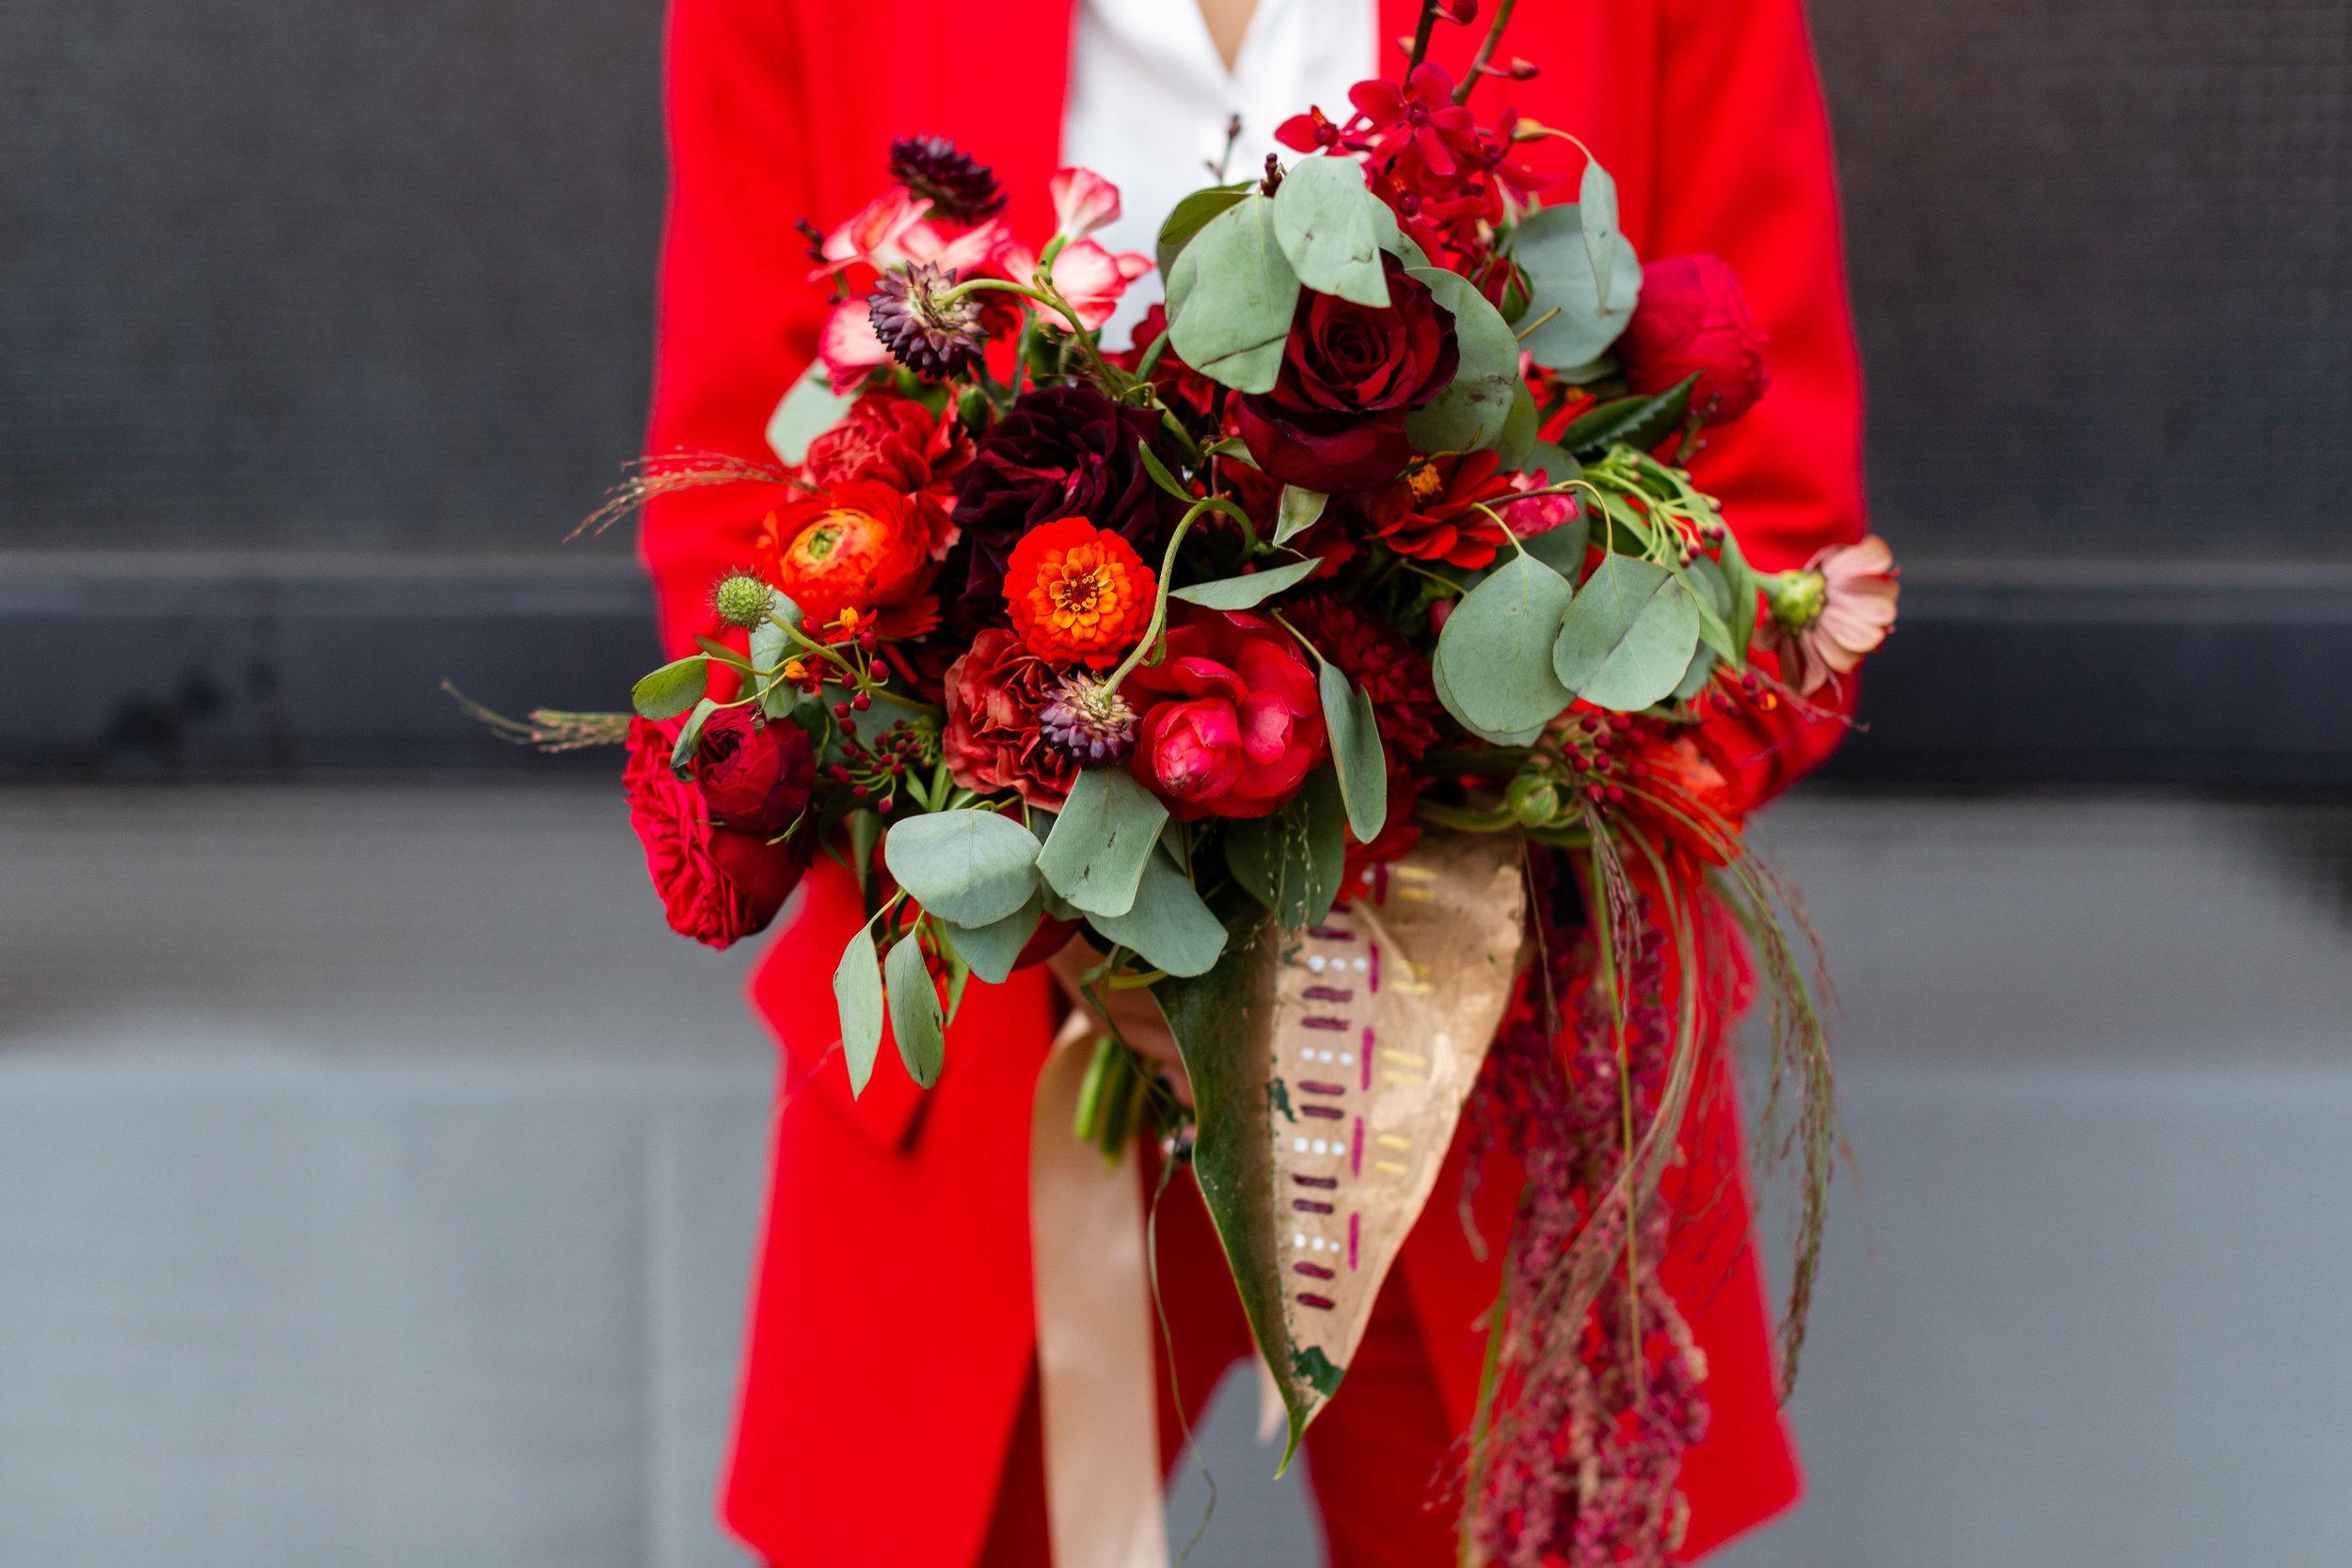 Elizabeth_Joab_multicultural_wedding_Petronella_Photography_793.jpg